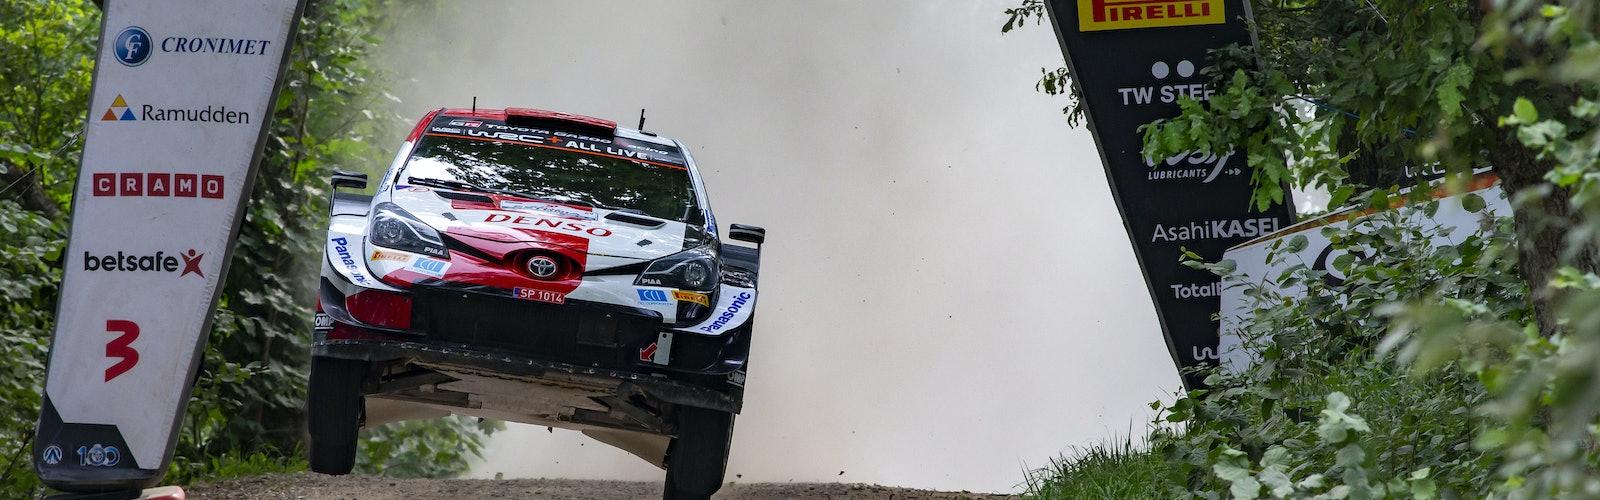 WRC_2021_Rd.7_186